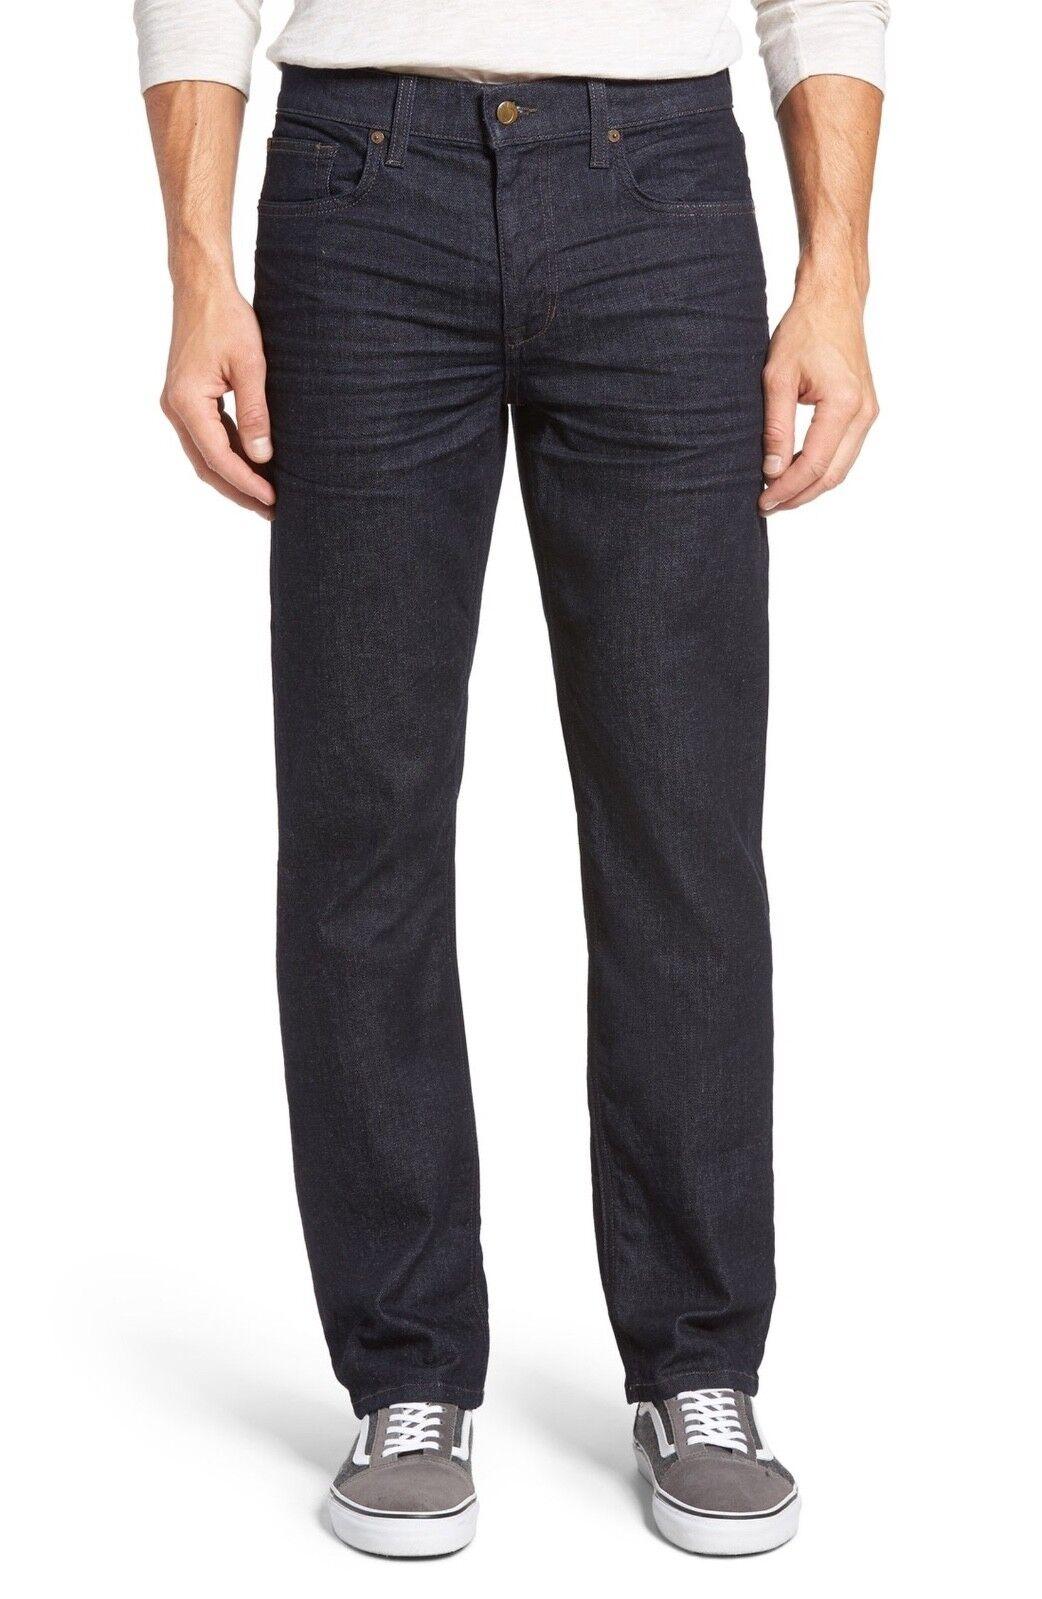 Joes Jeans Men's Classic Fit Straight Leg Jean Dark bluee Denim Many Sizes